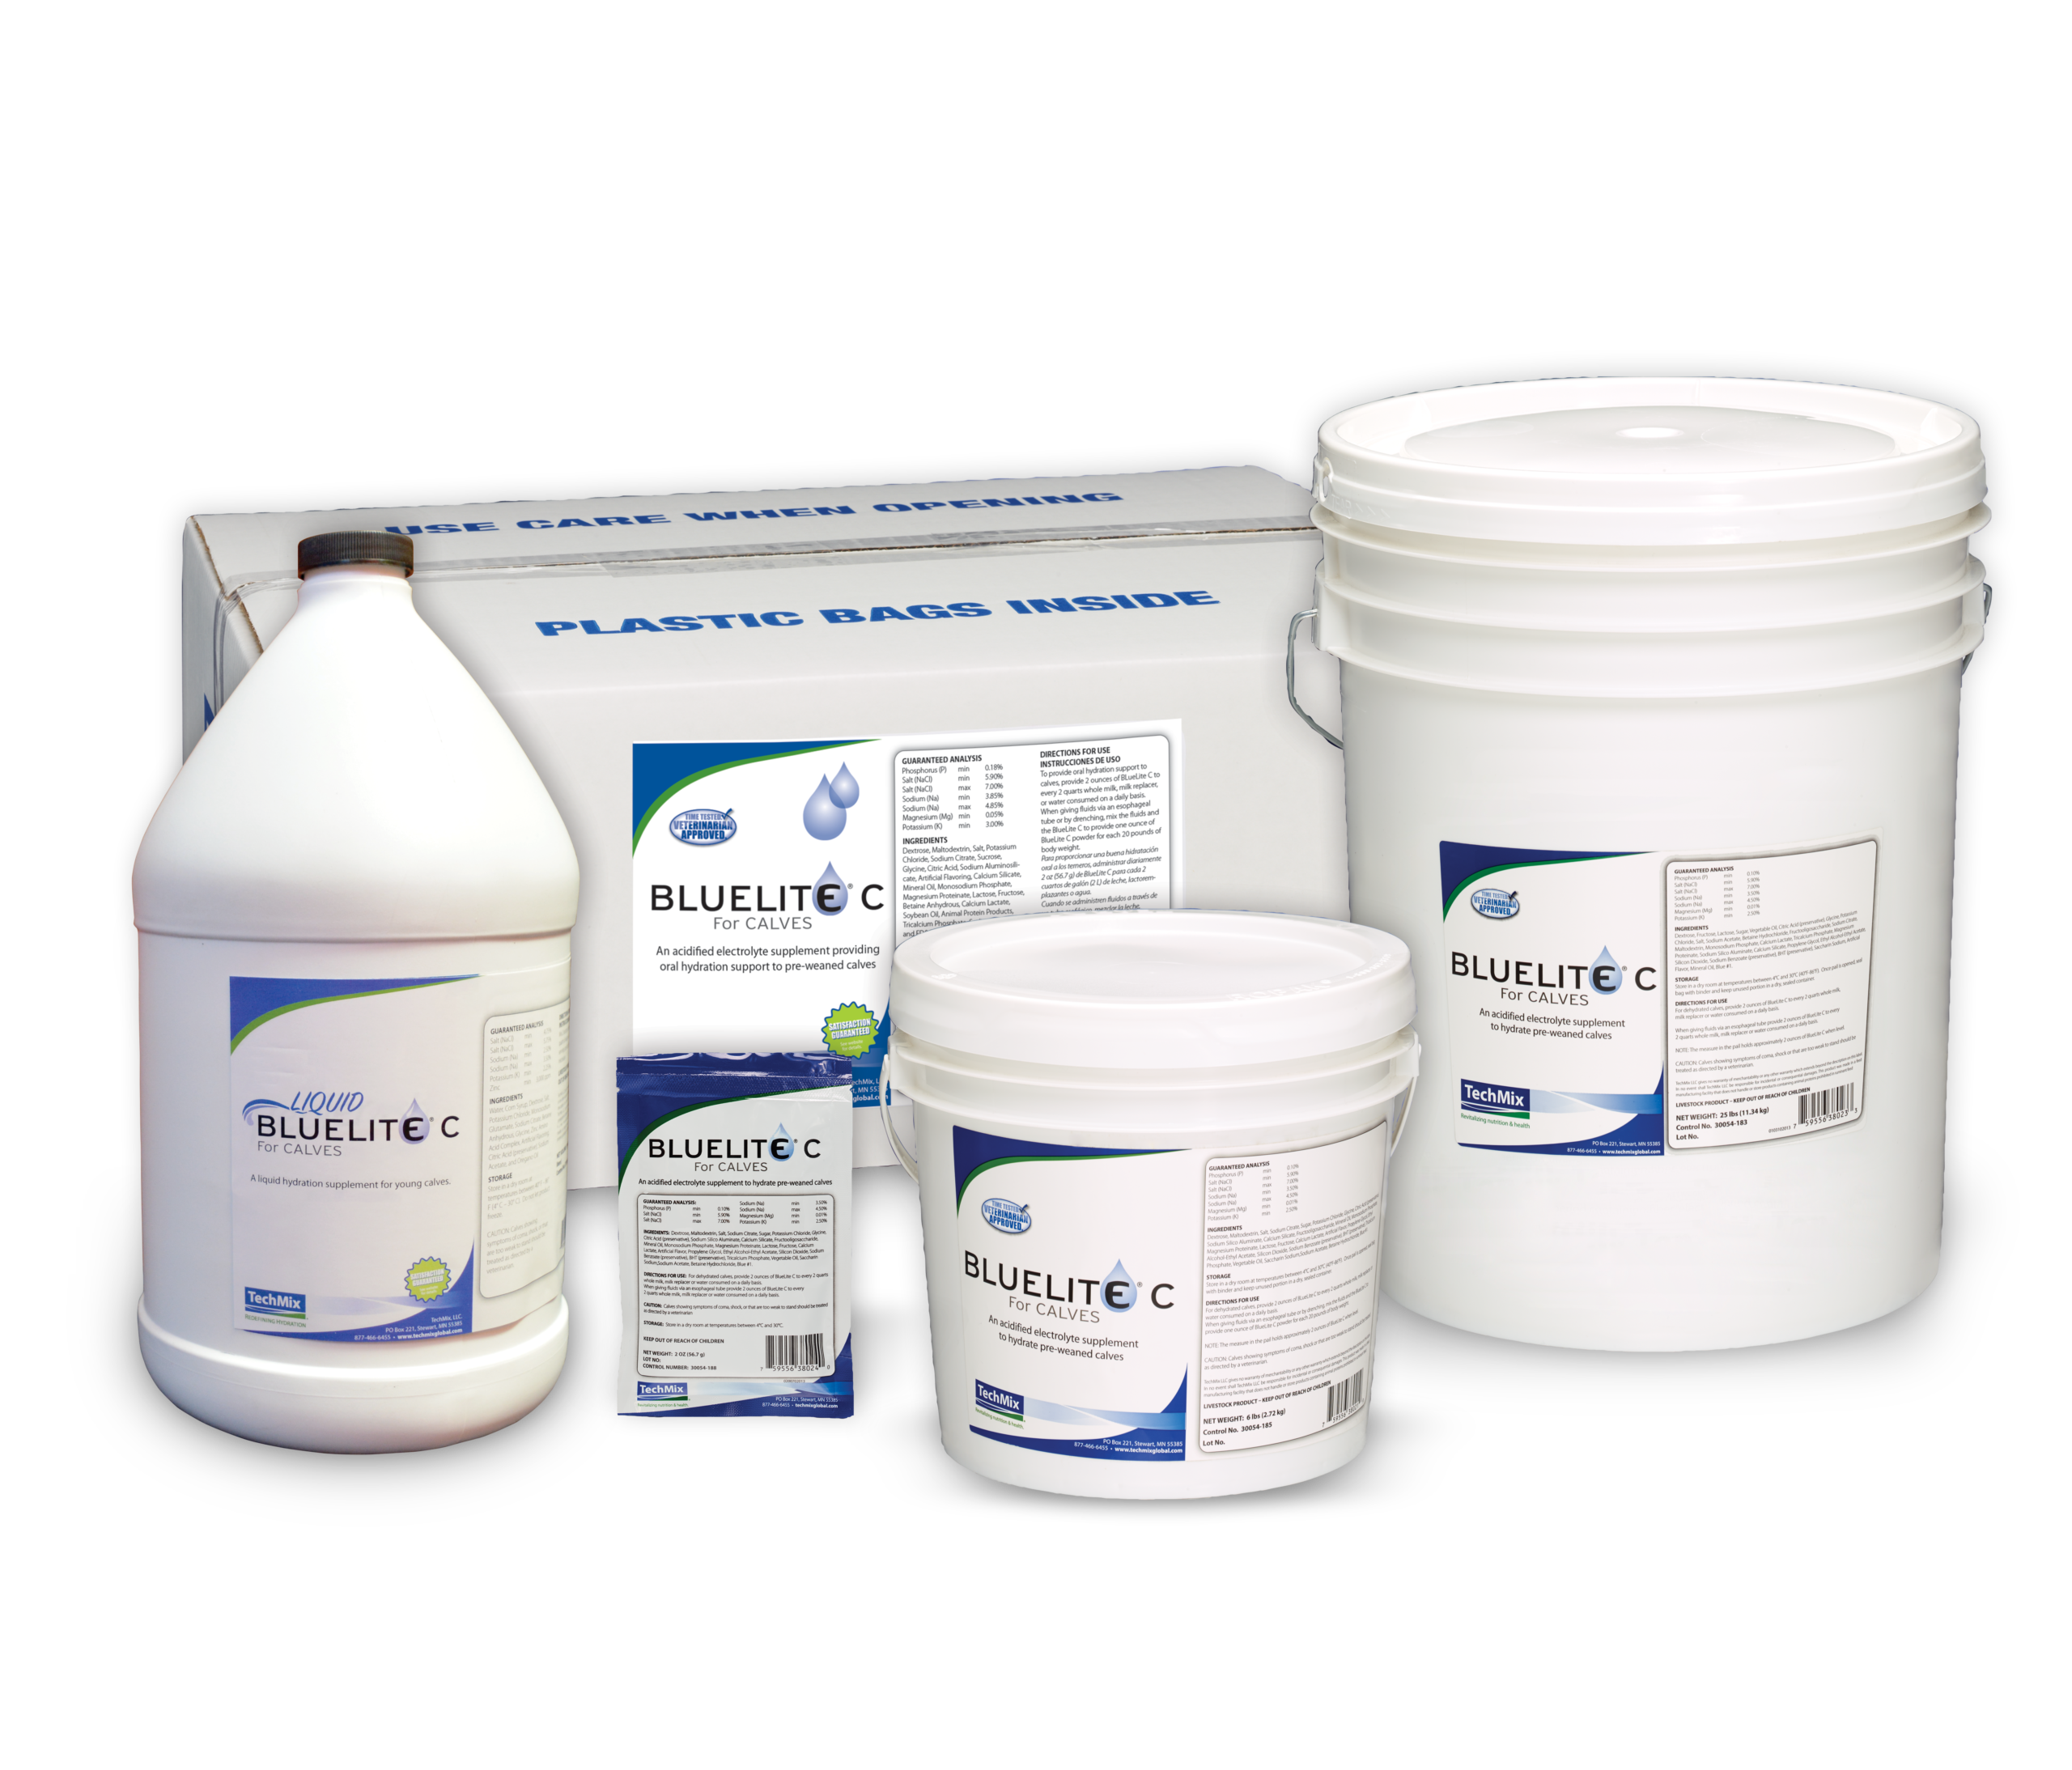 BlueLite C family product image